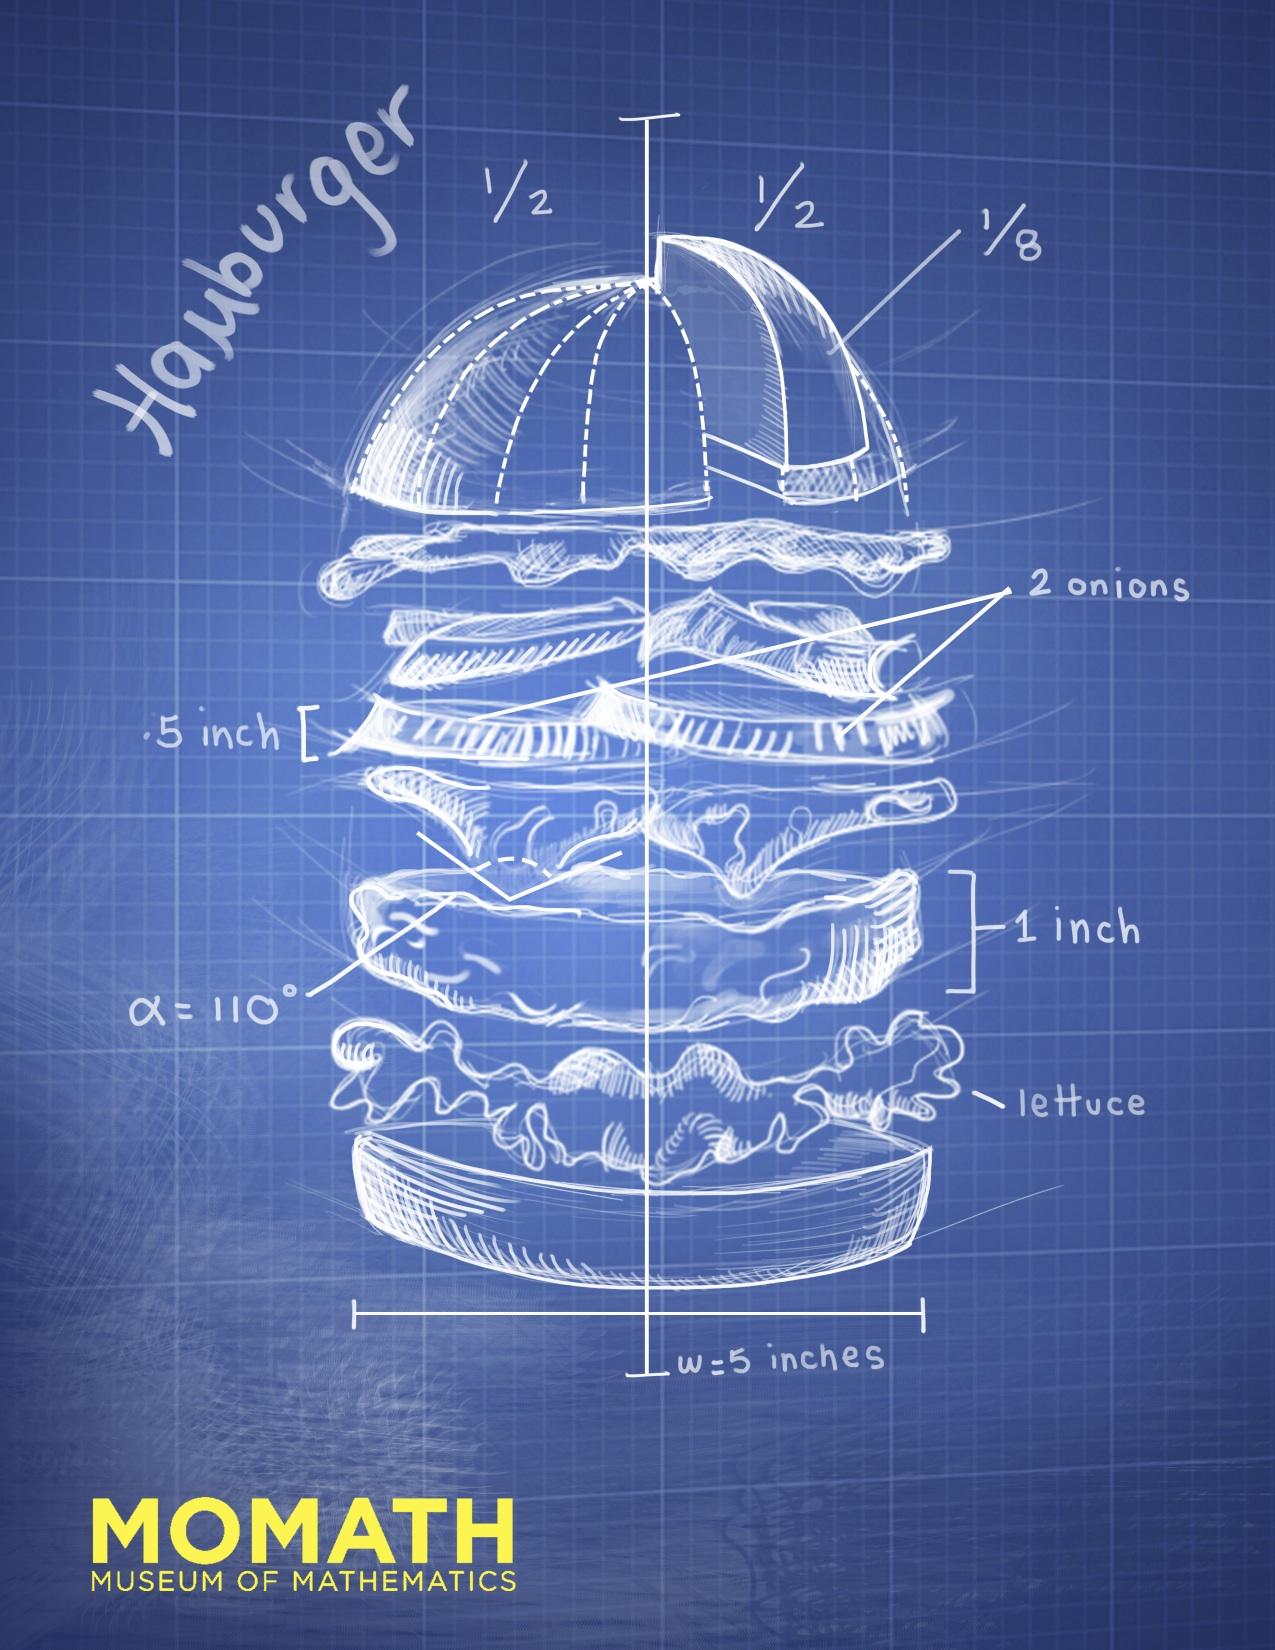 hamburgesa_blueprint.jpg